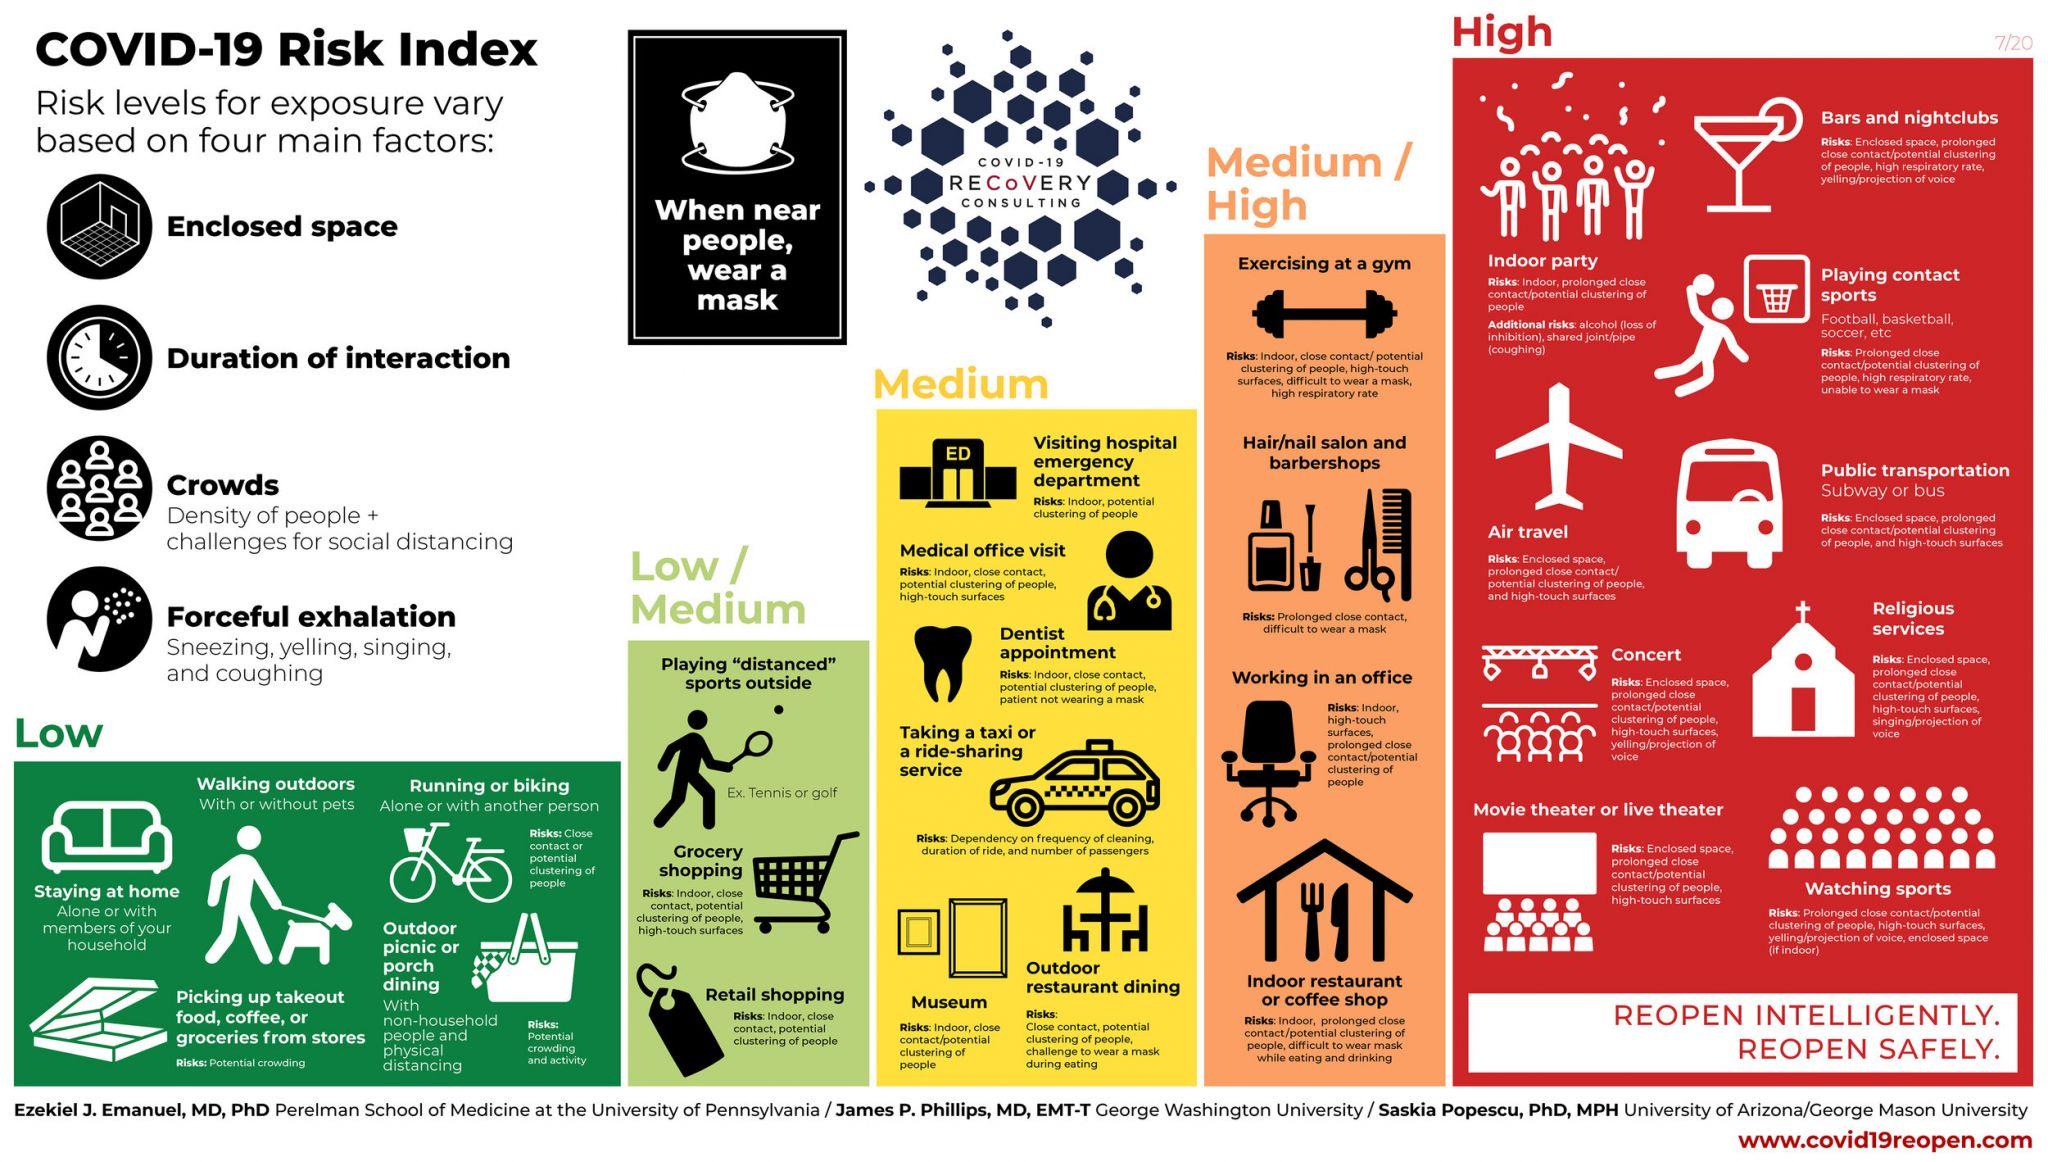 COVID-19 Risk Index